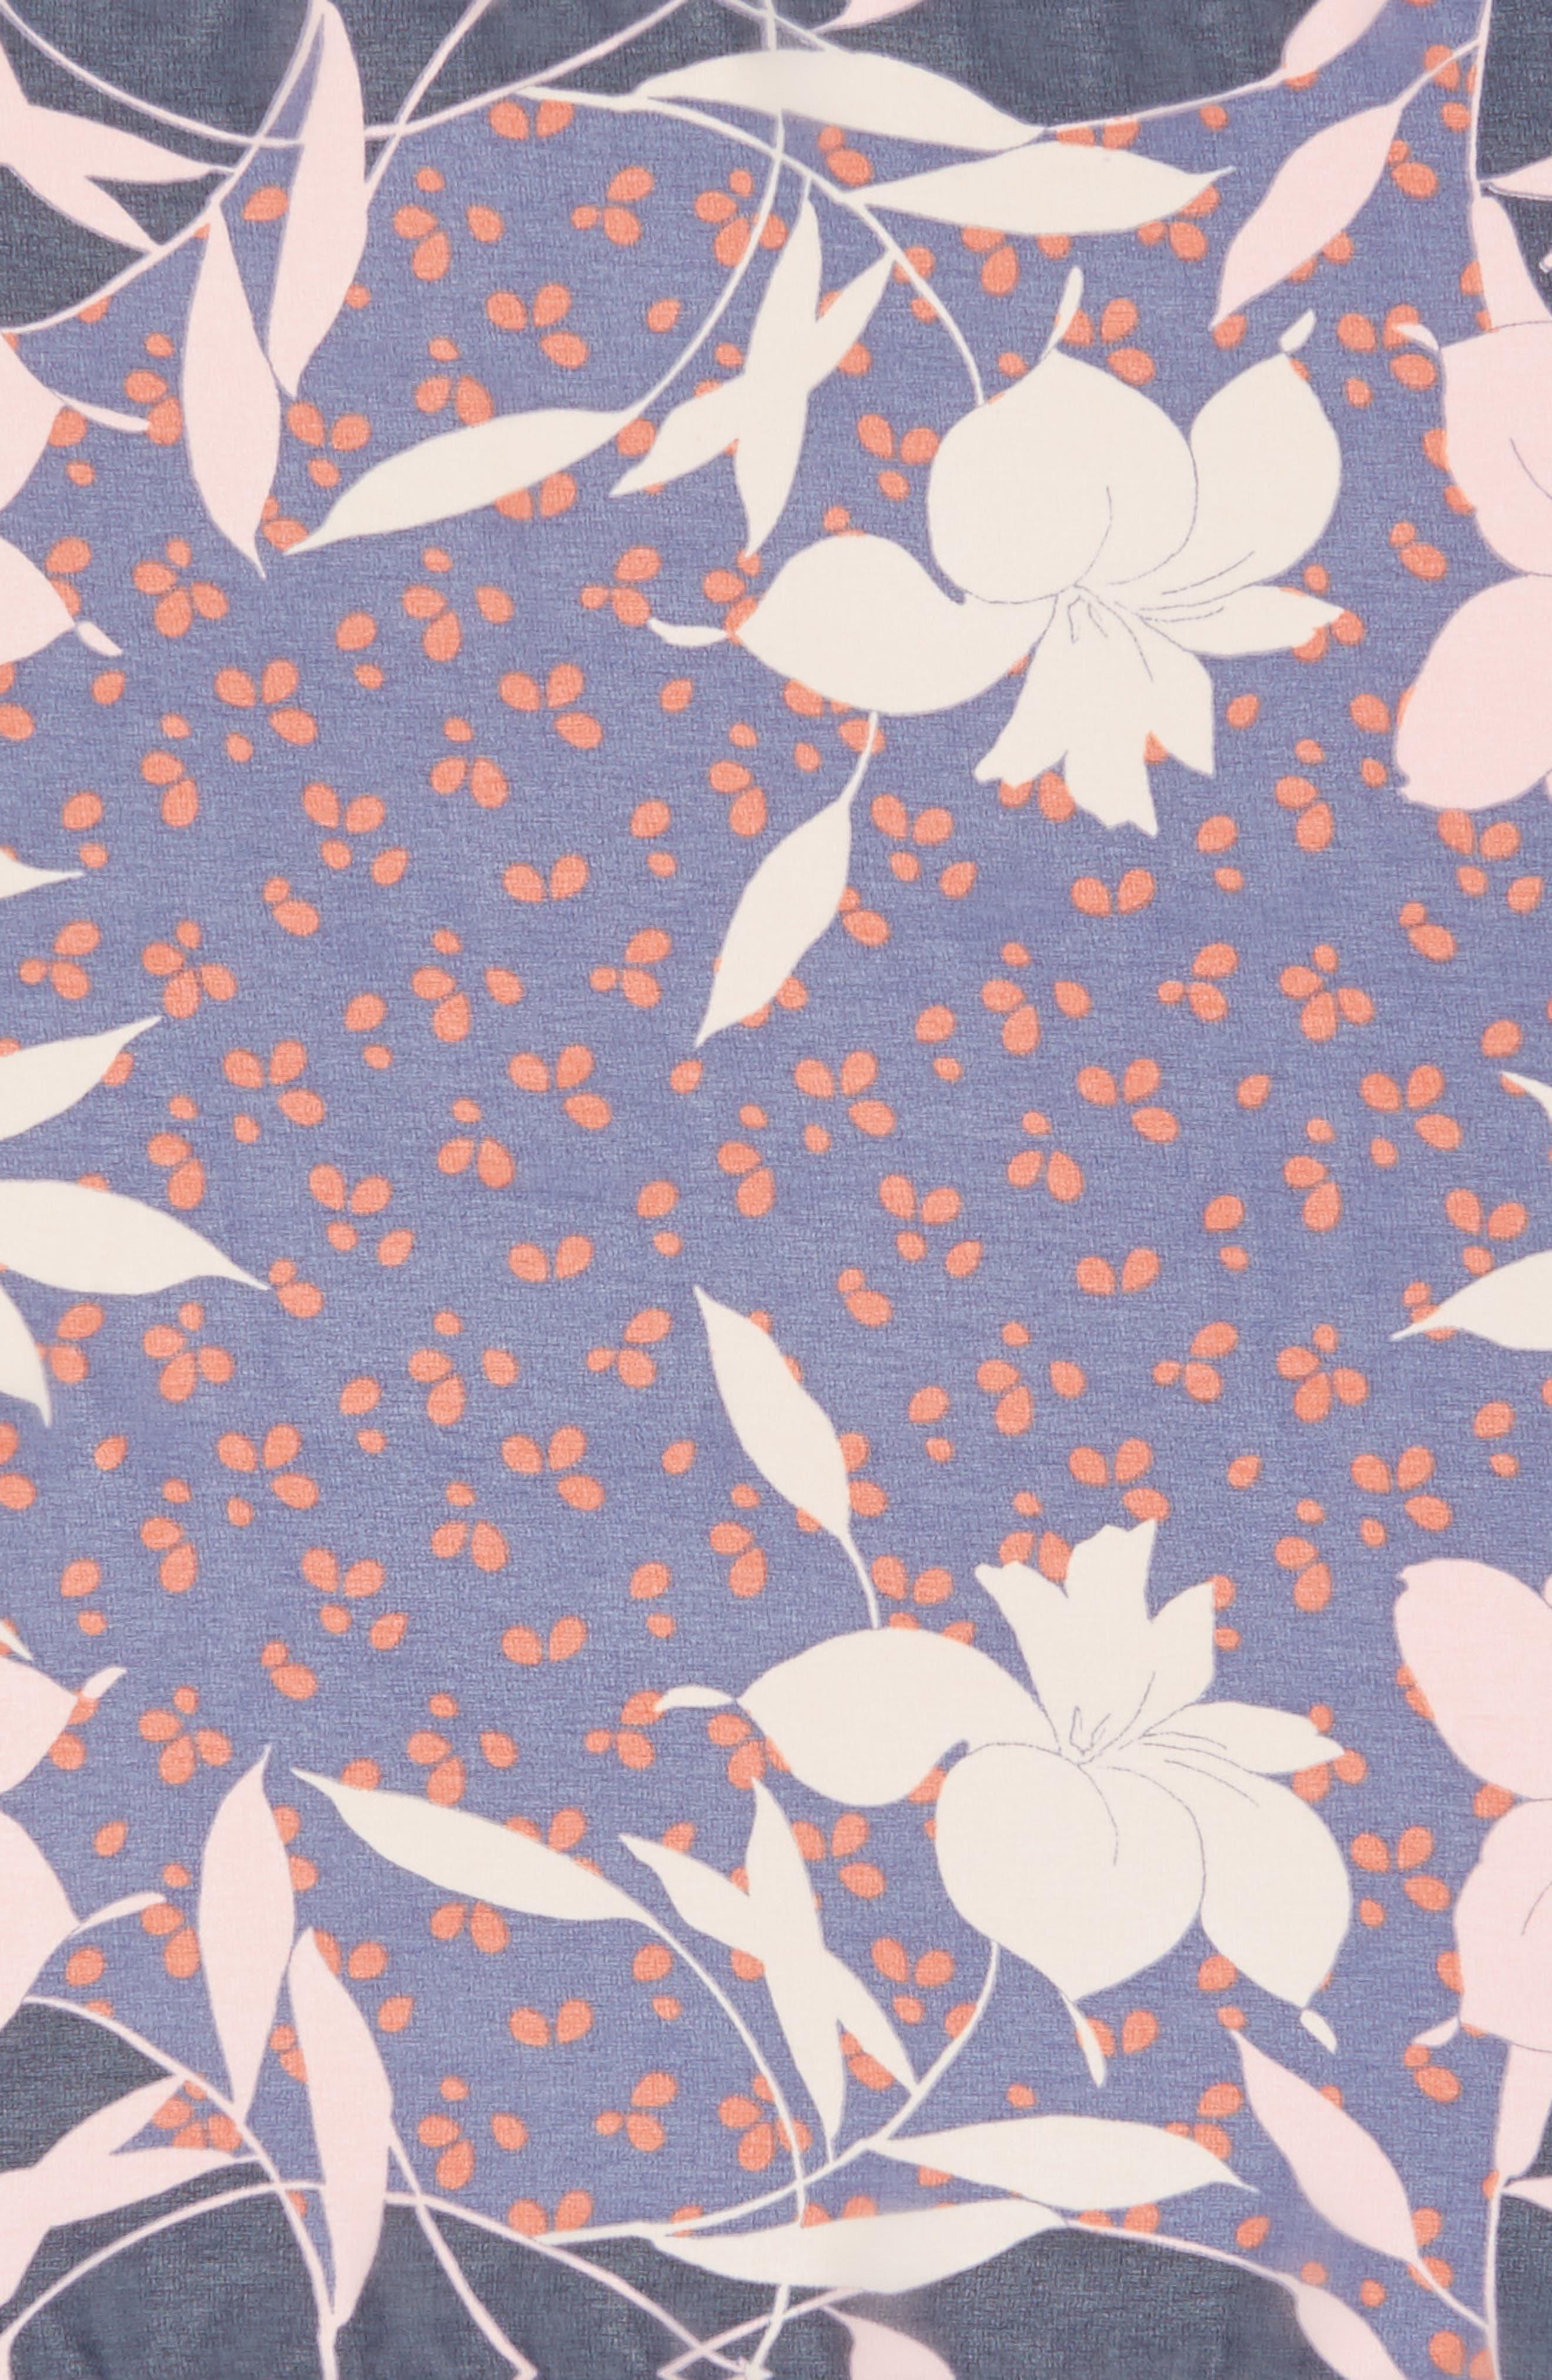 Floral Square Scarf,                             Alternate thumbnail 4, color,                             410